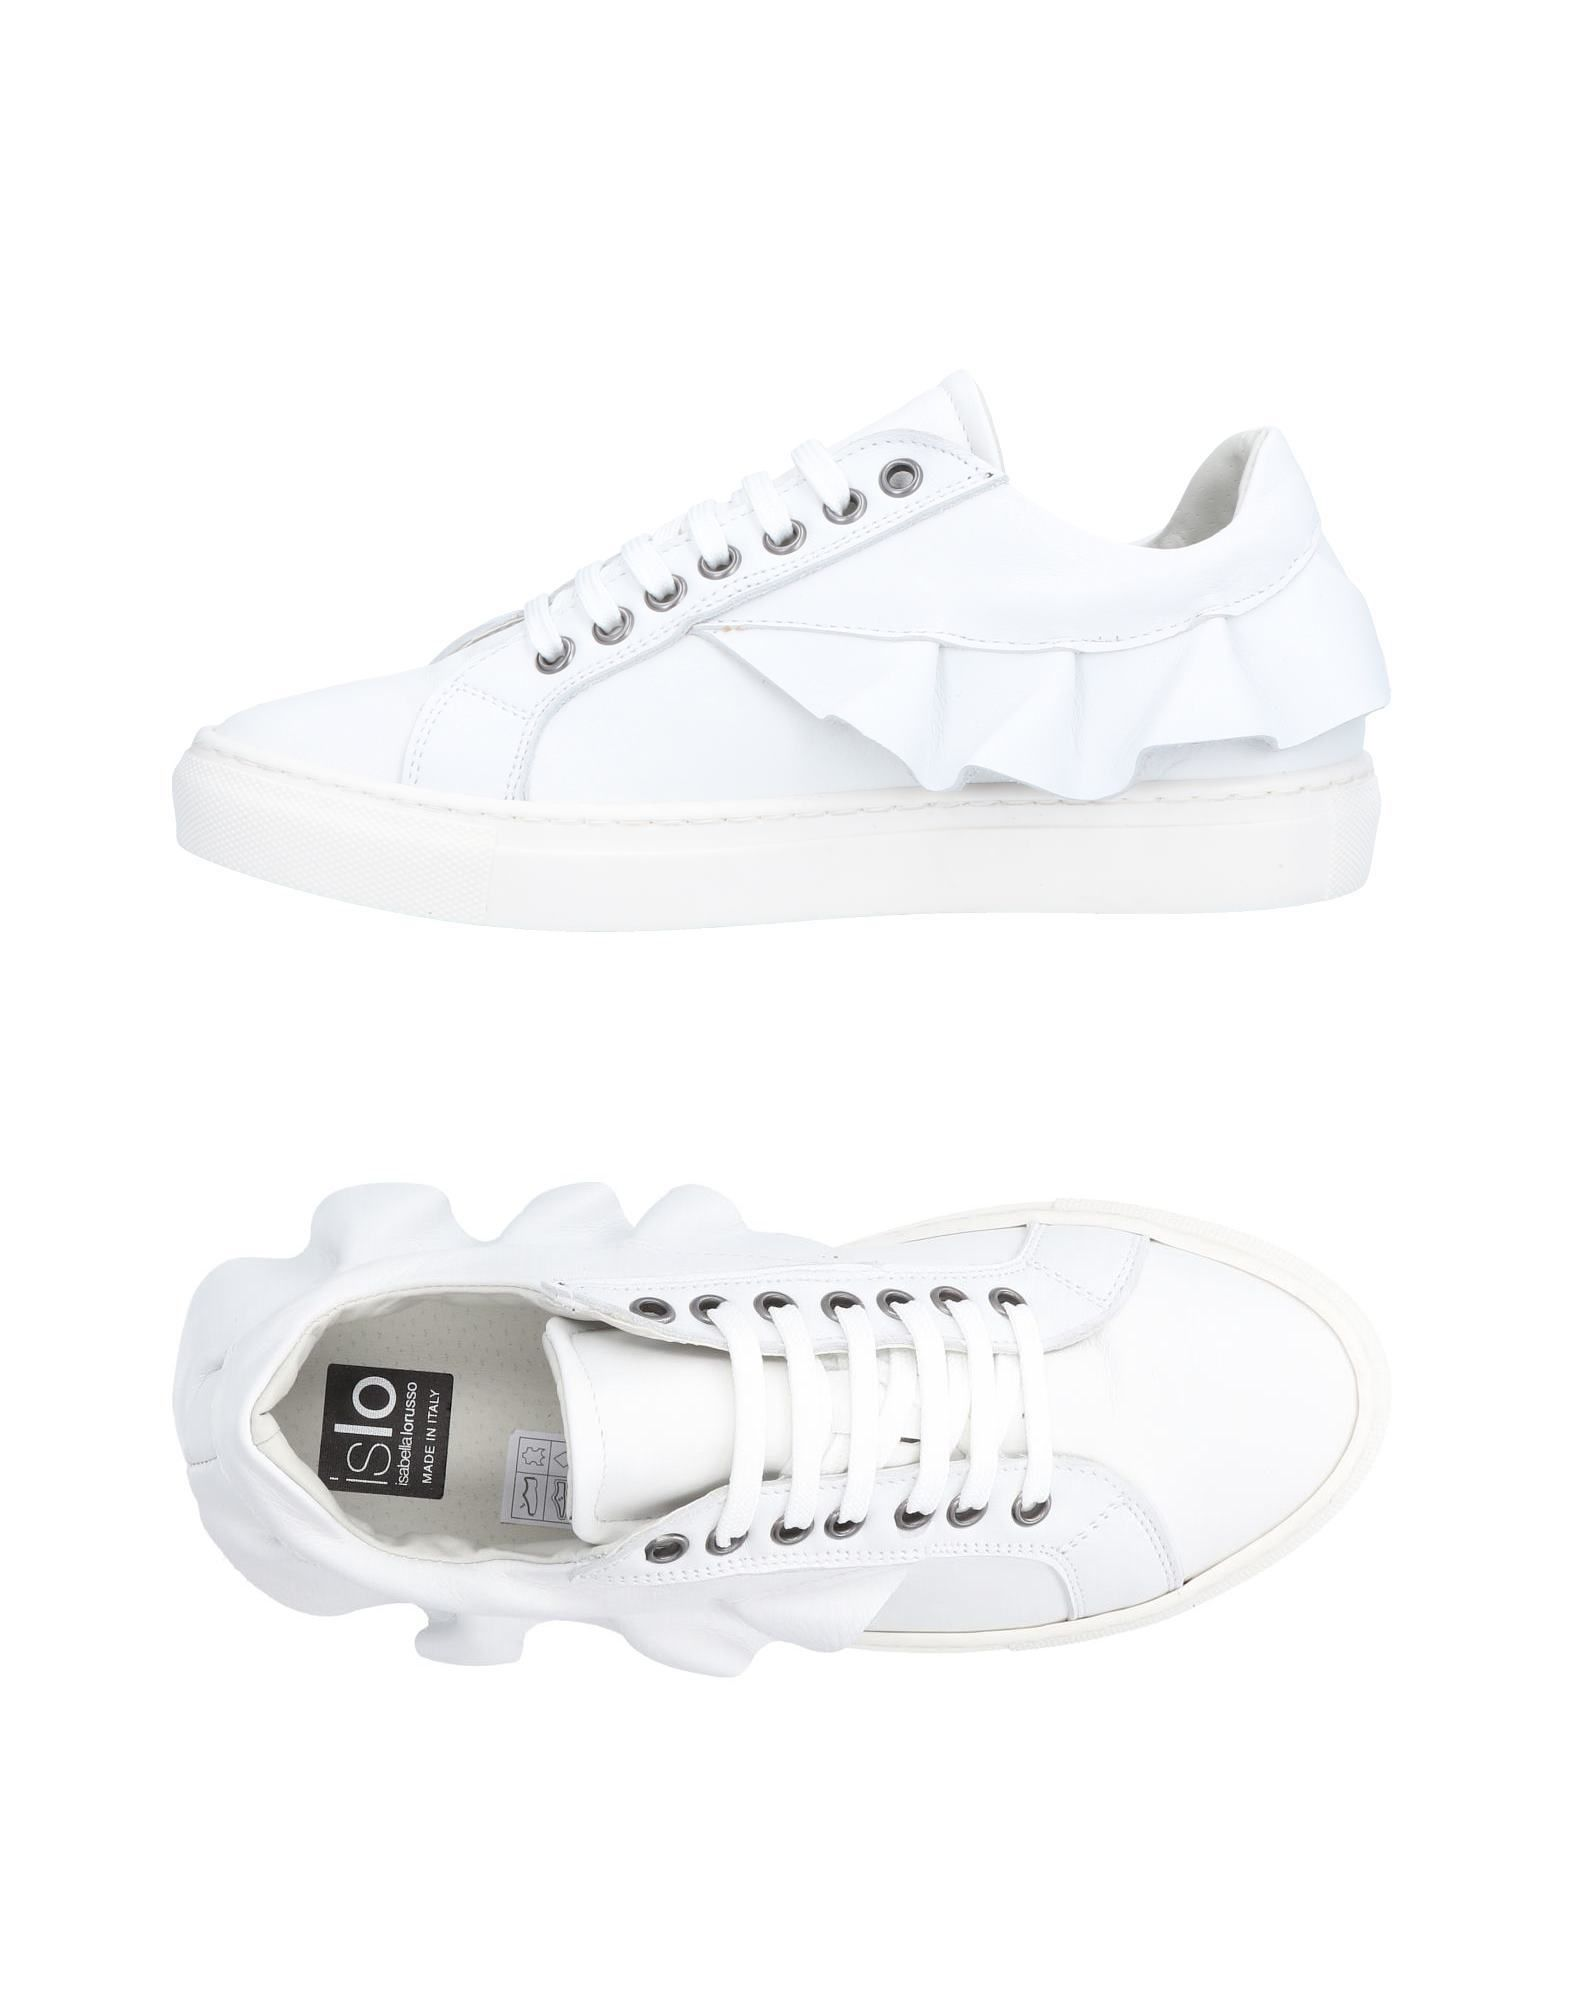 Islo Isabella Lorusso Sneakers Damen  11471272XR Gute Qualität beliebte Schuhe